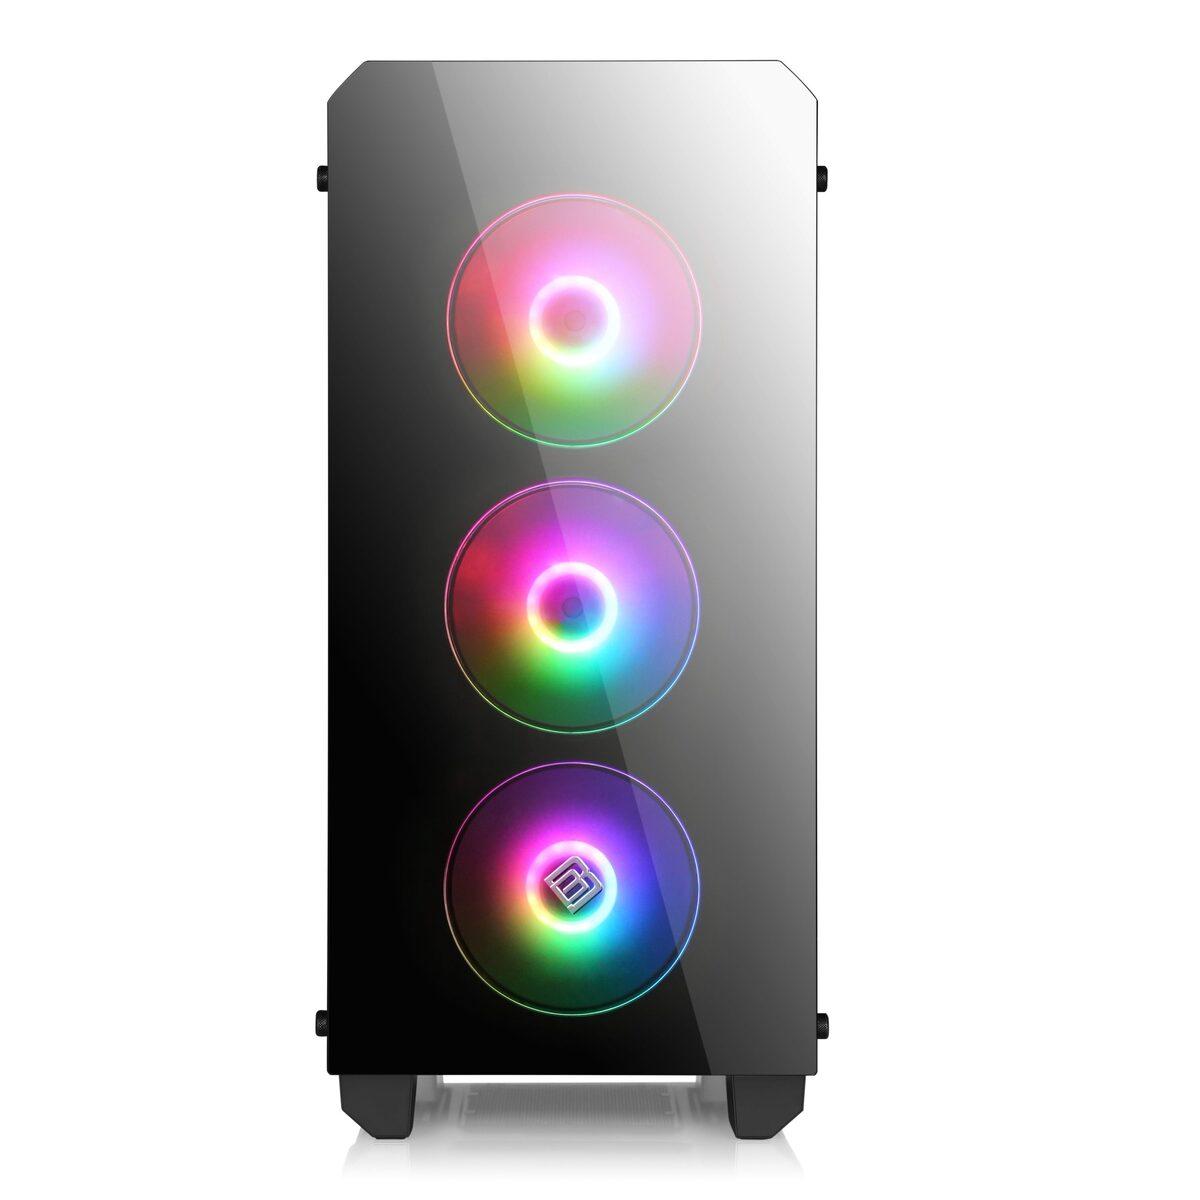 Bild 5 von CSL Levitas T8118 Windows 10 Home Gaming-PC (AMD Ryzen 3, Radeon Vega 8, 16 GB RAM, 1000 GB SSD, AMD Ryzen 3 3200G, Vega 8, 16 GB RAM, SSD)